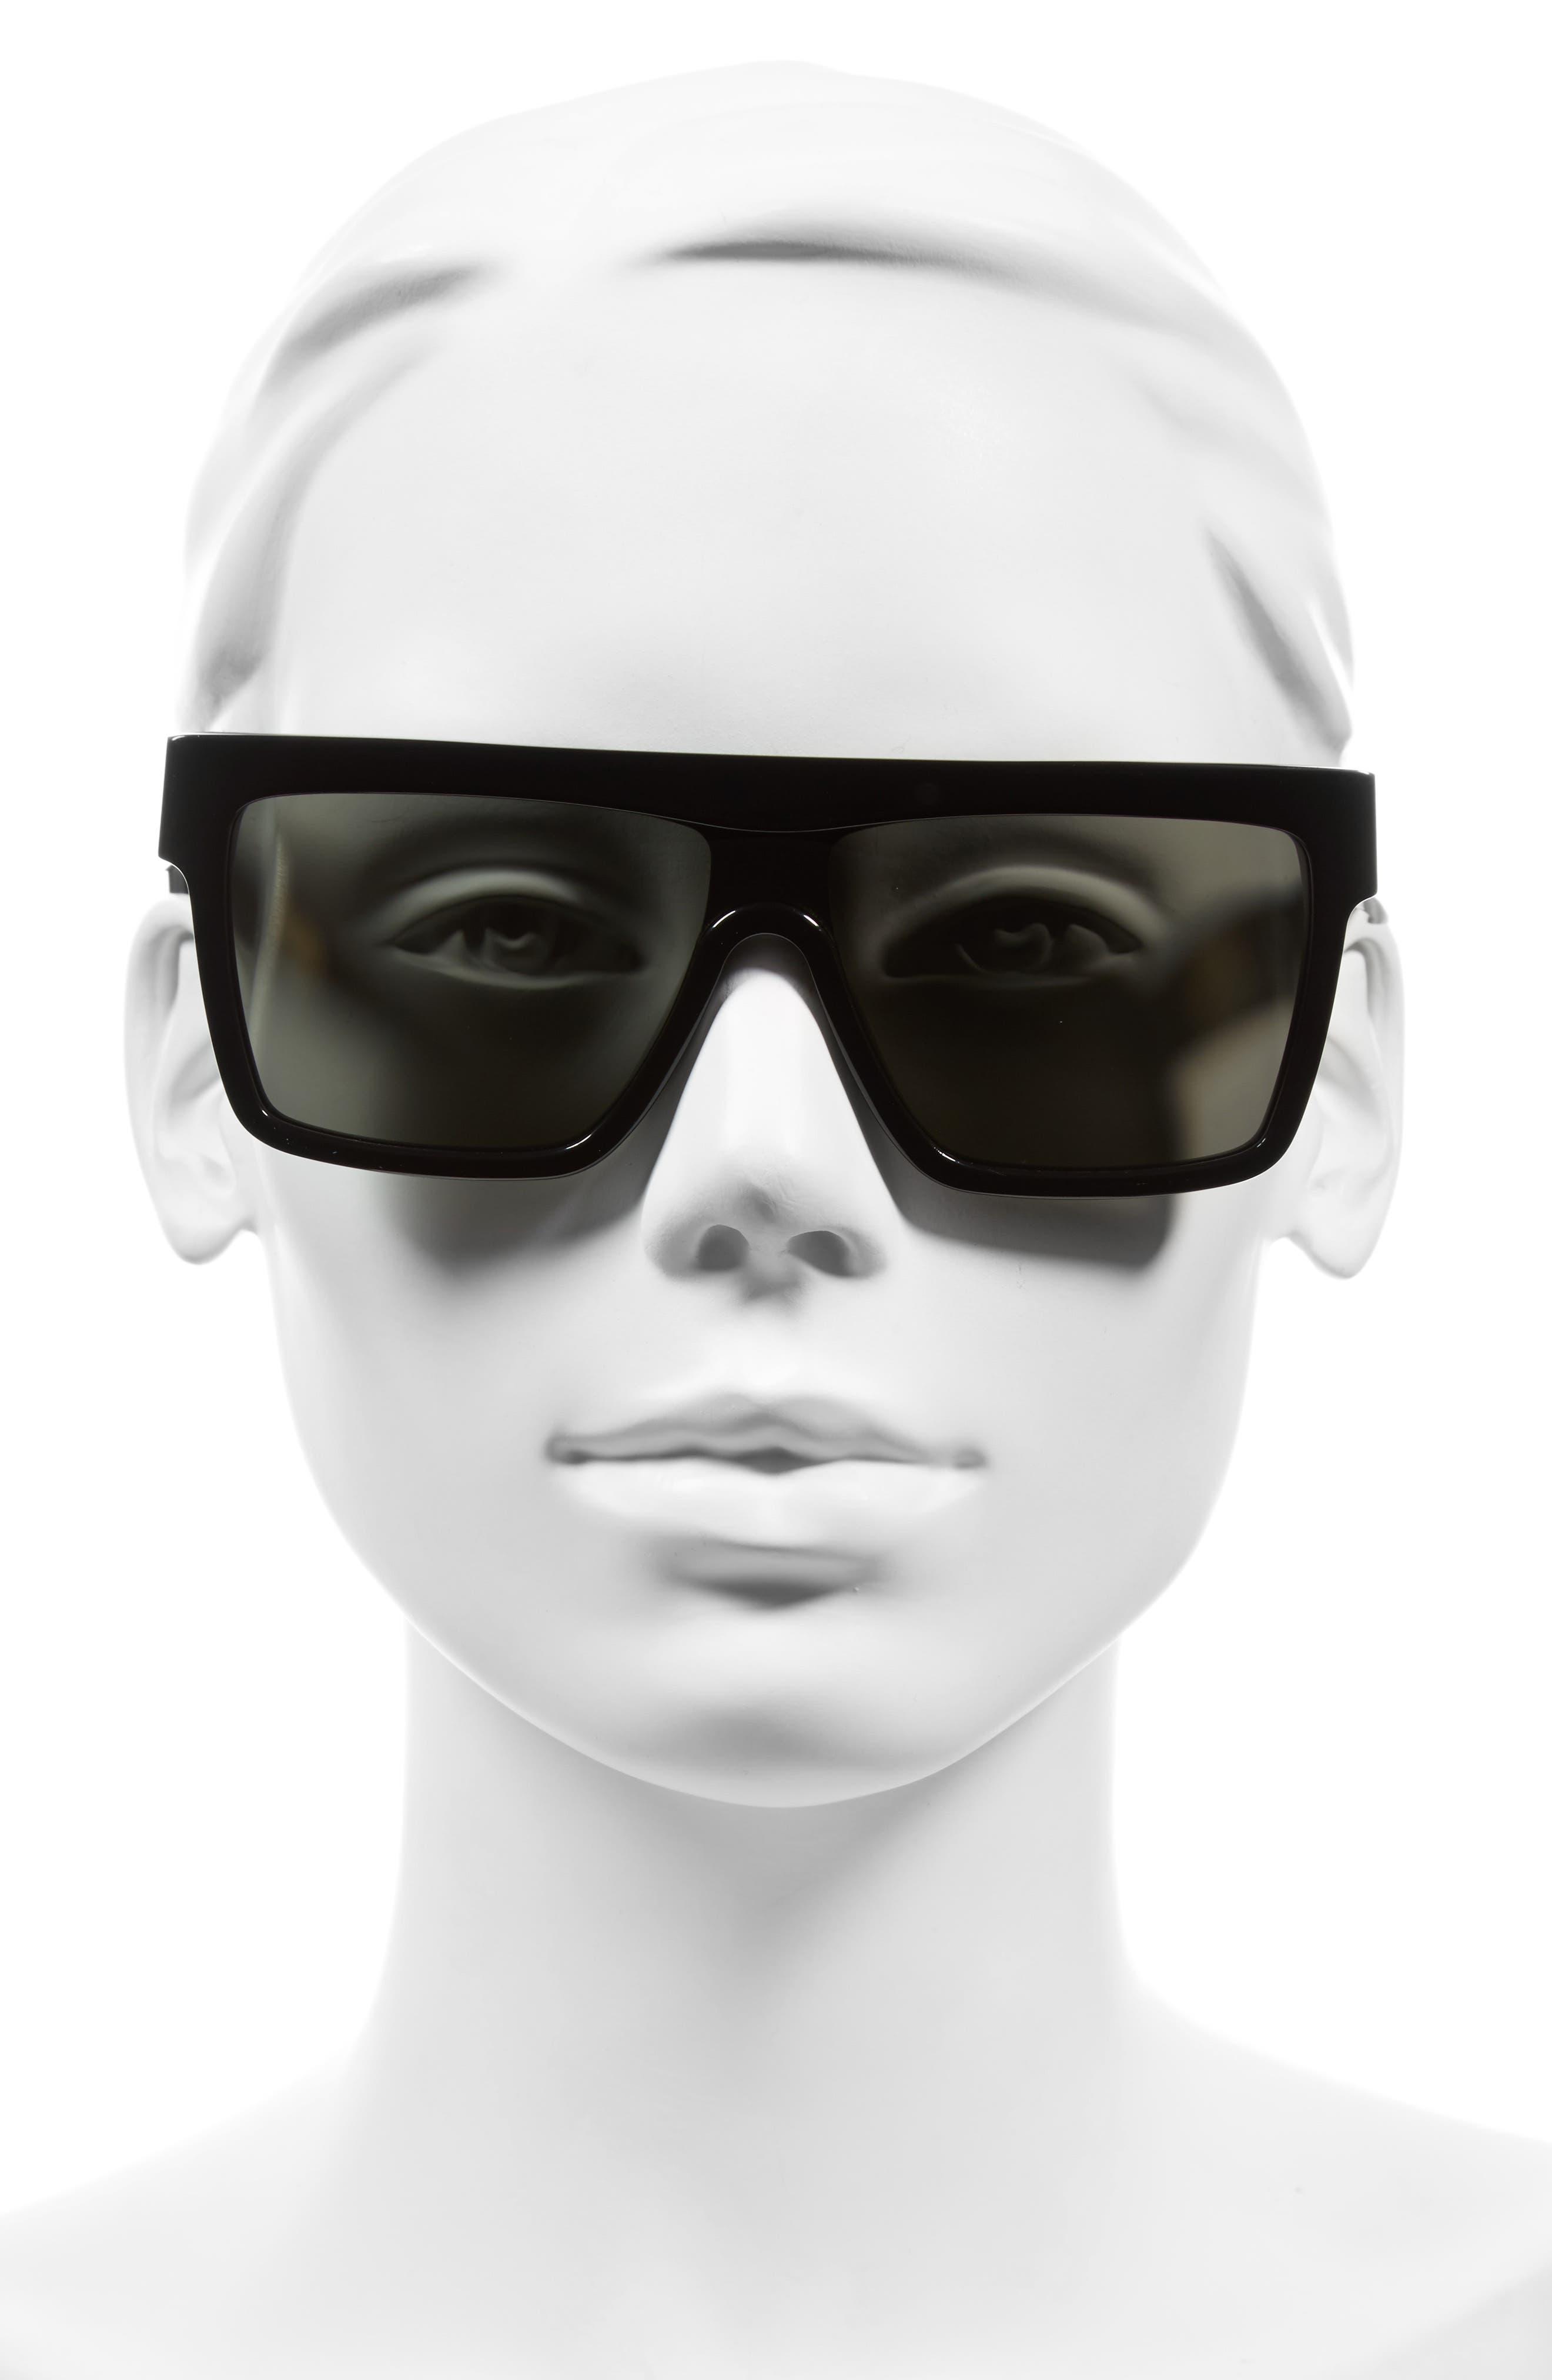 VICTORIA BECKHAM,                             57mm Flat Top Sunglasses,                             Alternate thumbnail 2, color,                             001